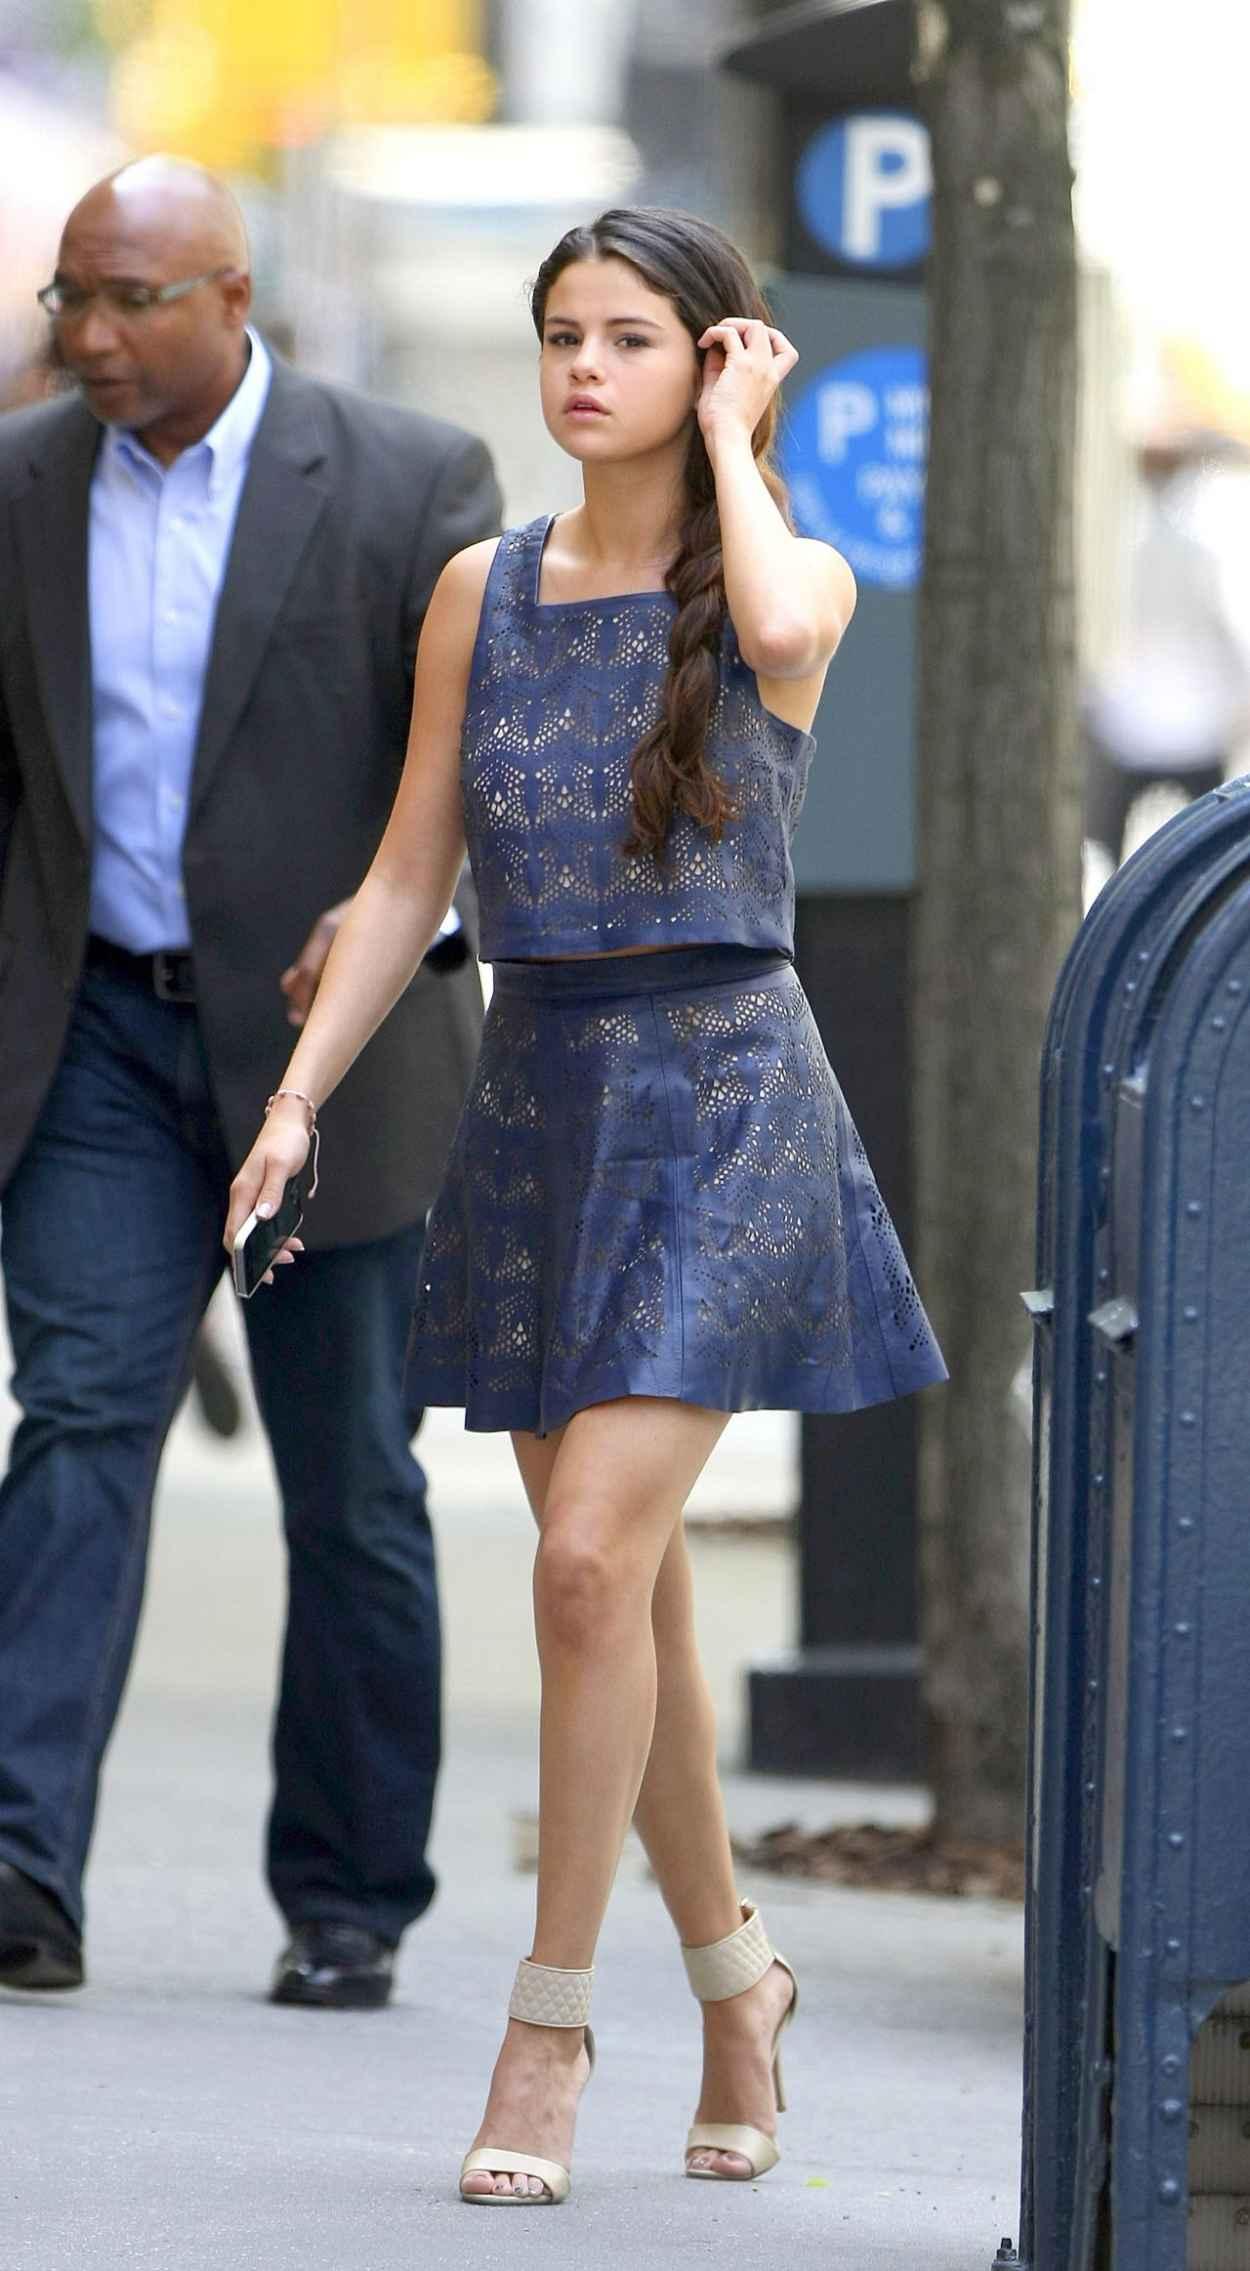 NEW YORK , USA - MAY 2015: Summer Day Manhattan Times Square Traffic Street  4k Circa May 2015 New York, Usa Stock Footage Video (100% Royalty-free)  10653656 ...